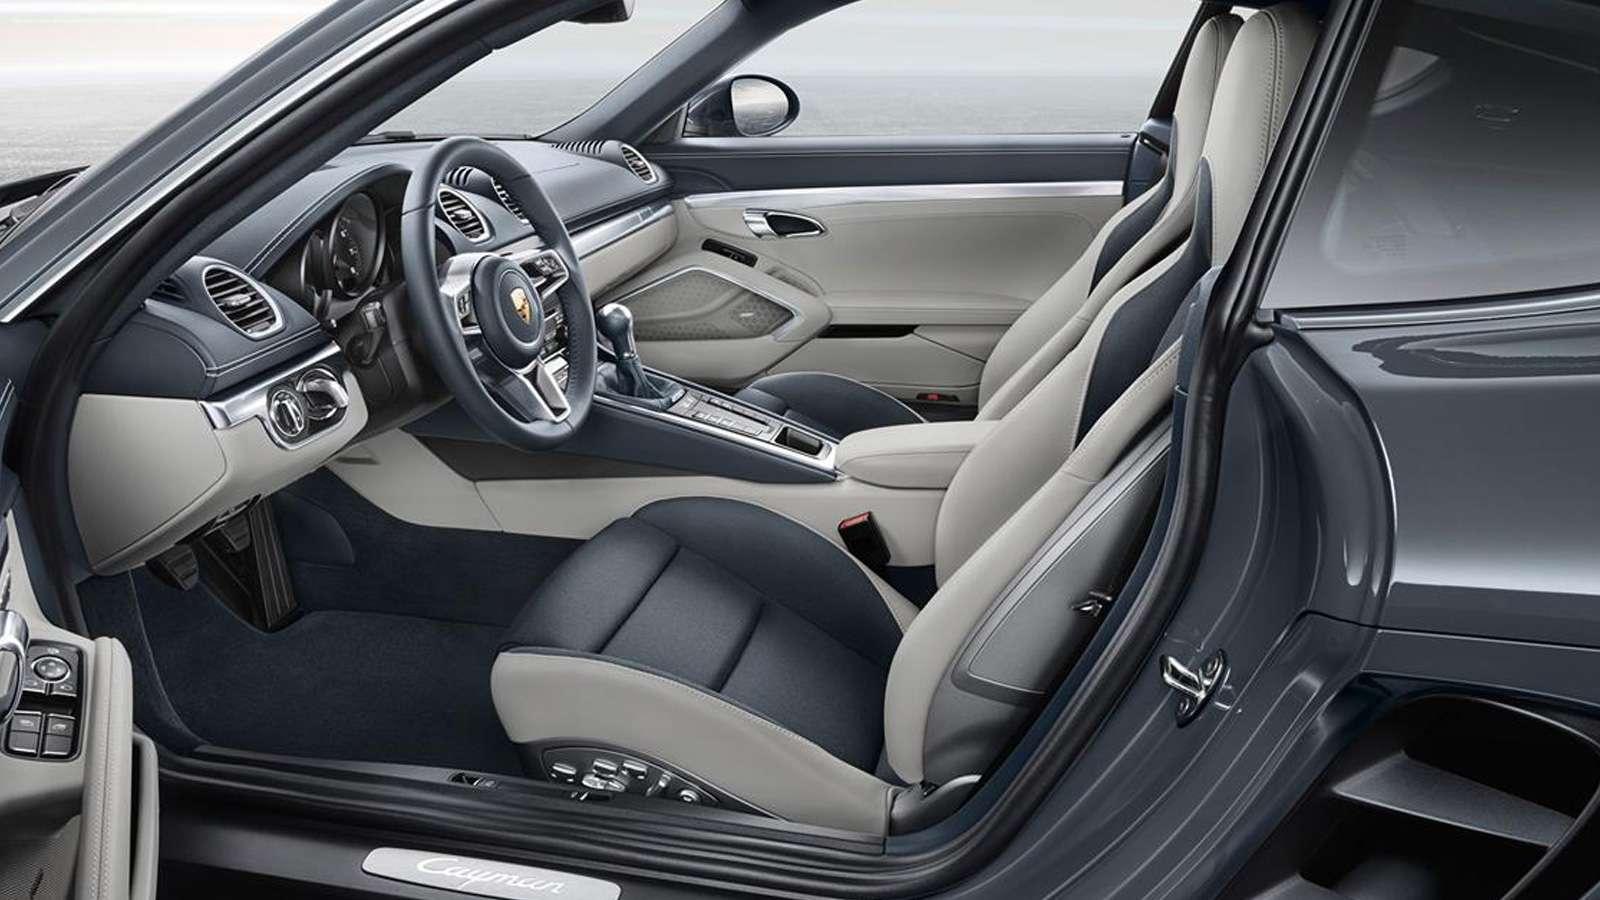 2018 Porsche 718 Cayman Interior